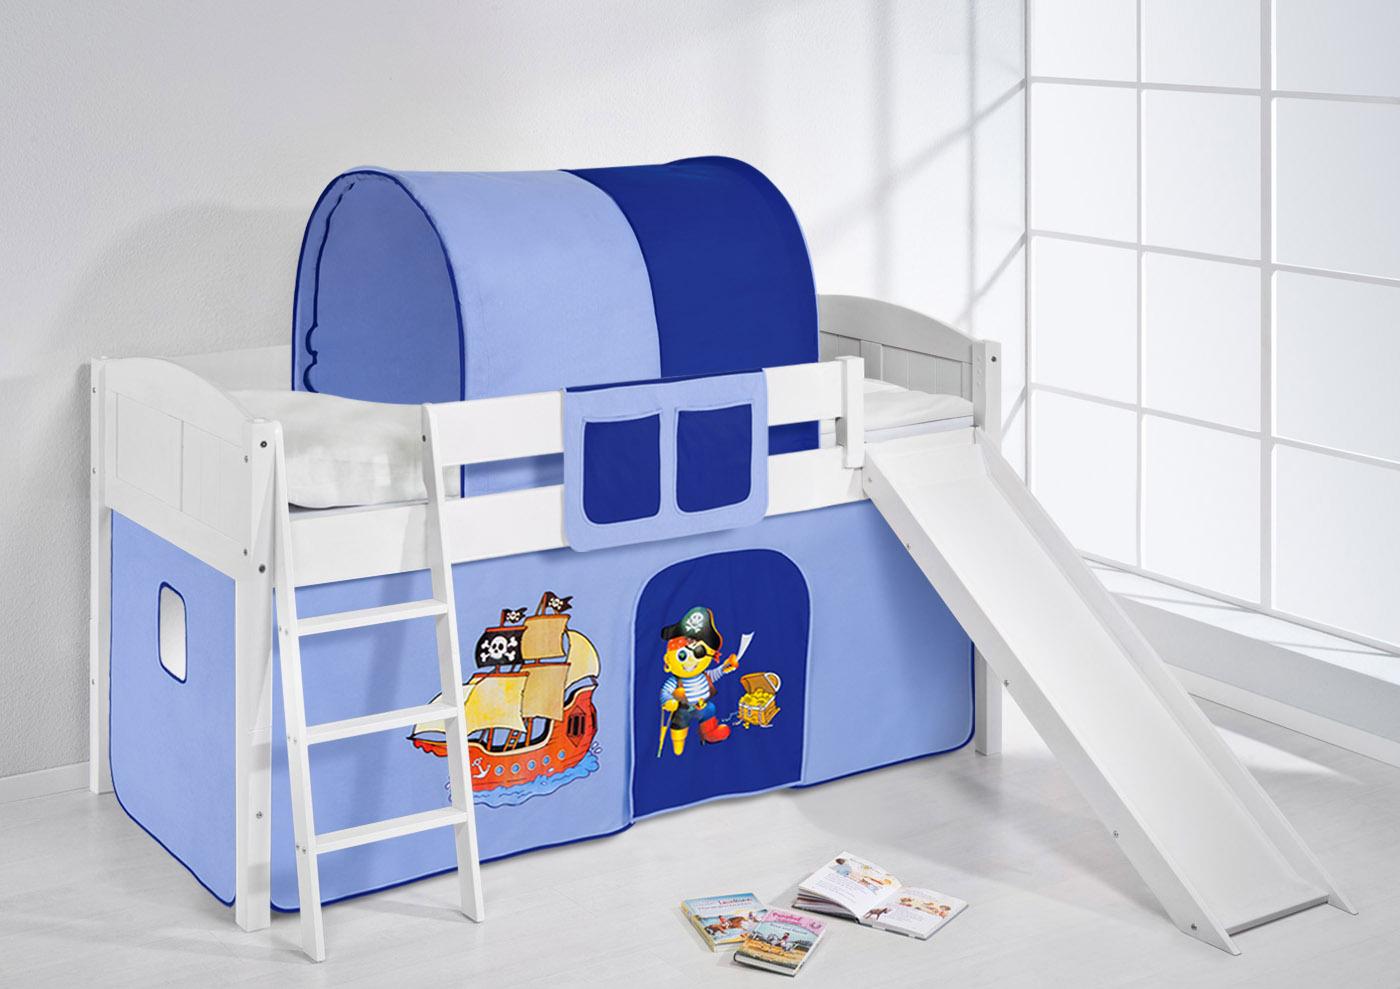 Etagenbett Kinder Umbaubar : Etagenbett kinder kinderbett funktionsbett tim umbaubar zu einem